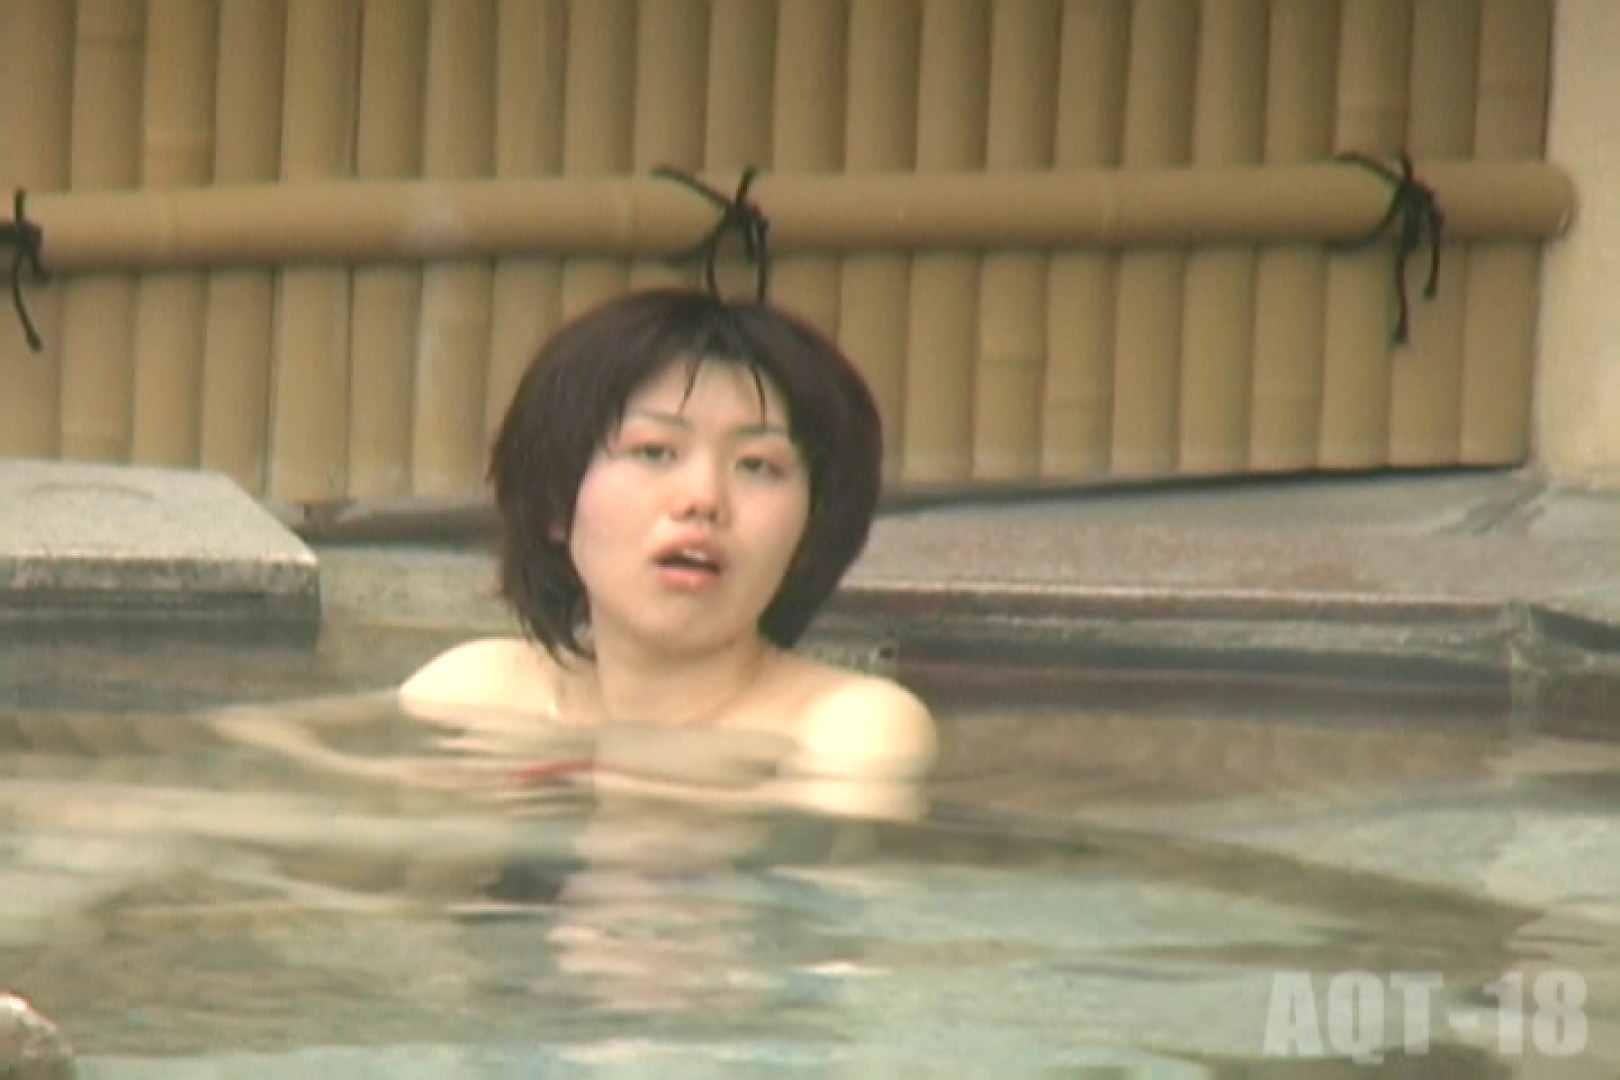 Aquaな露天風呂Vol.861 0  87連発 14